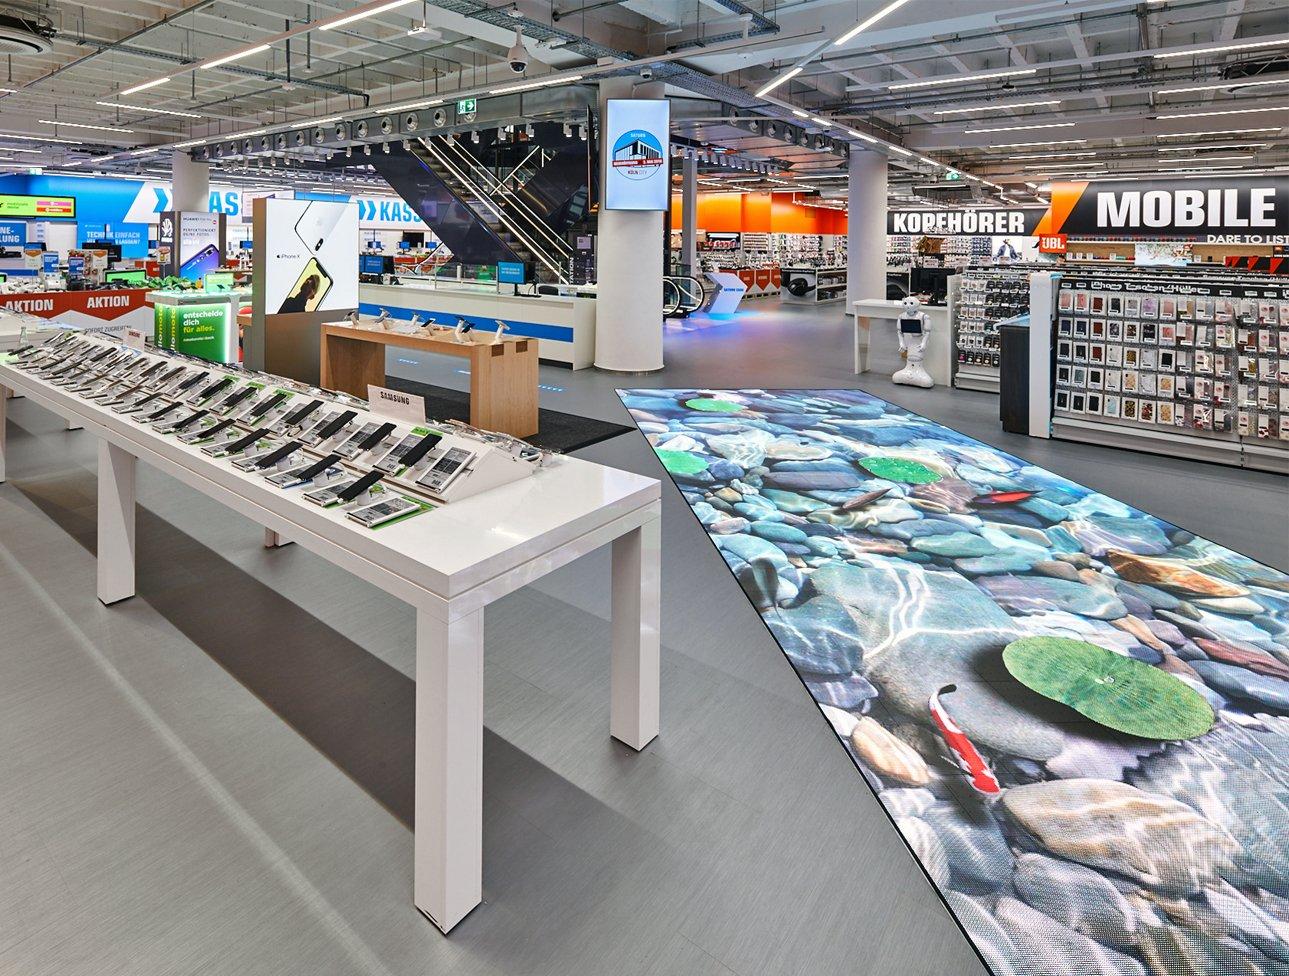 Saturn Store interactive floor POS